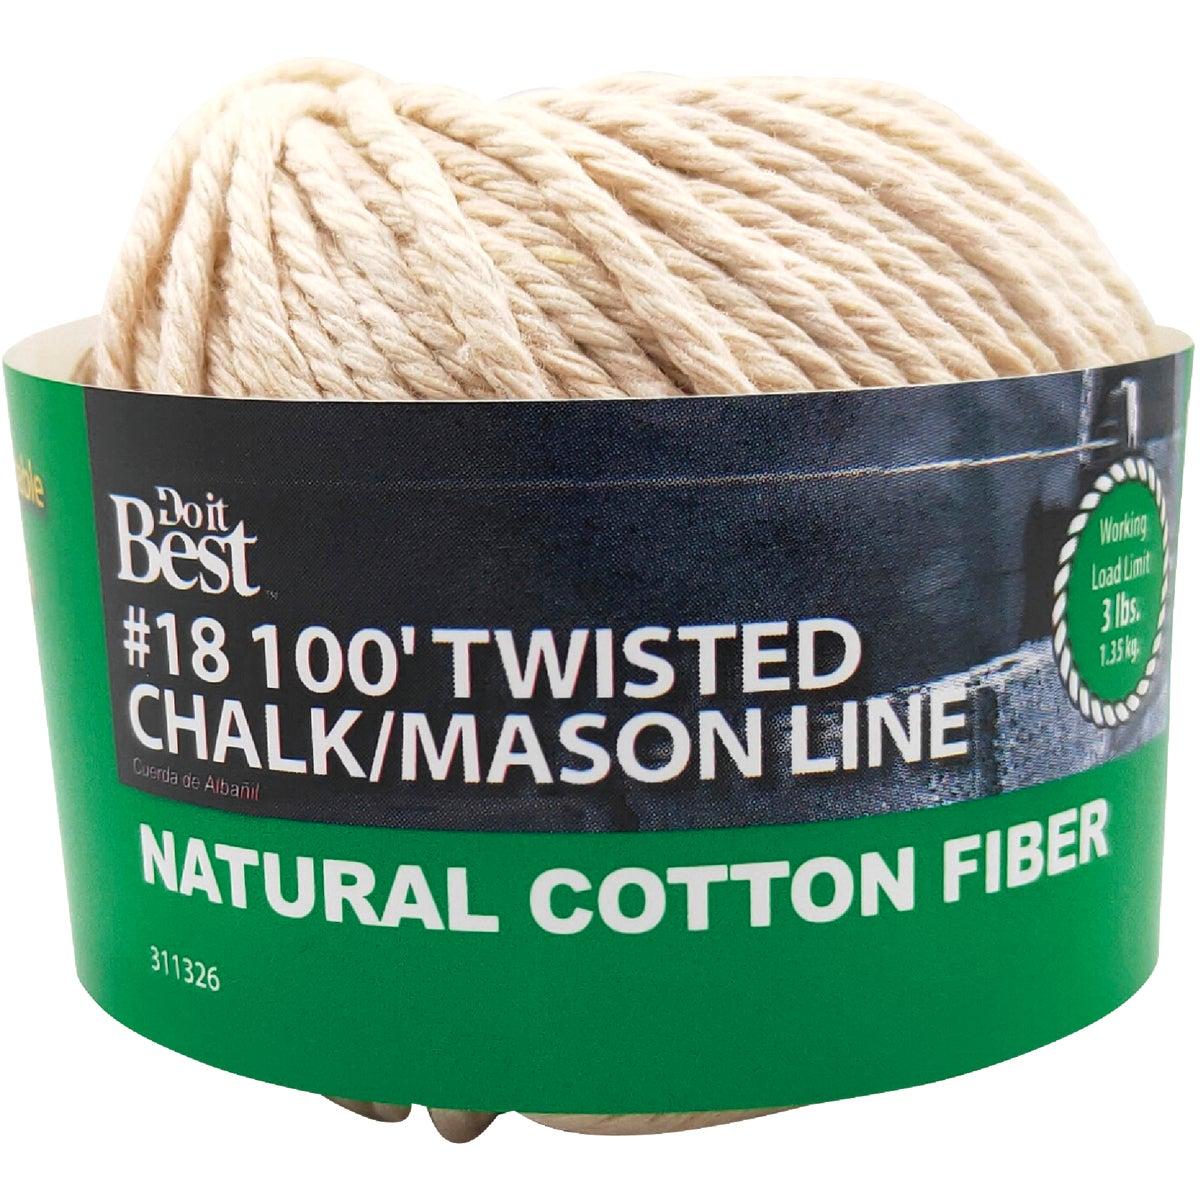 100' CHALK & MASON LINE